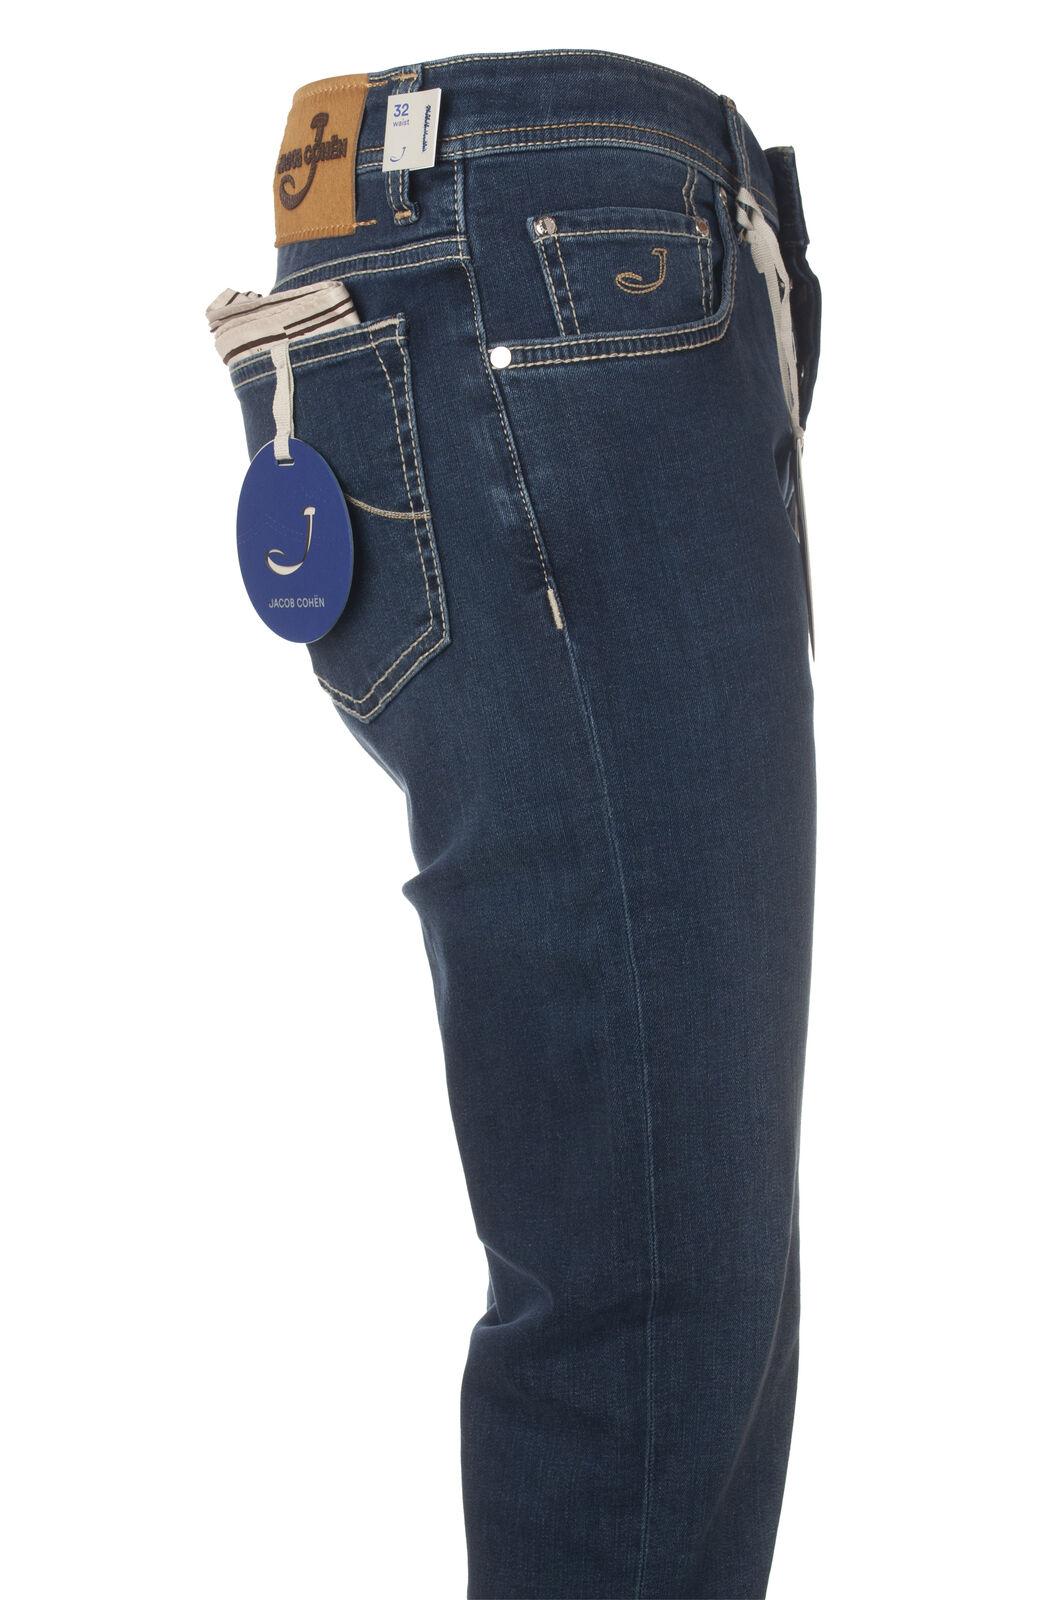 Jacob Cohen - Jeans-Pantaloni - Uomo - Denim - 5979110D191721